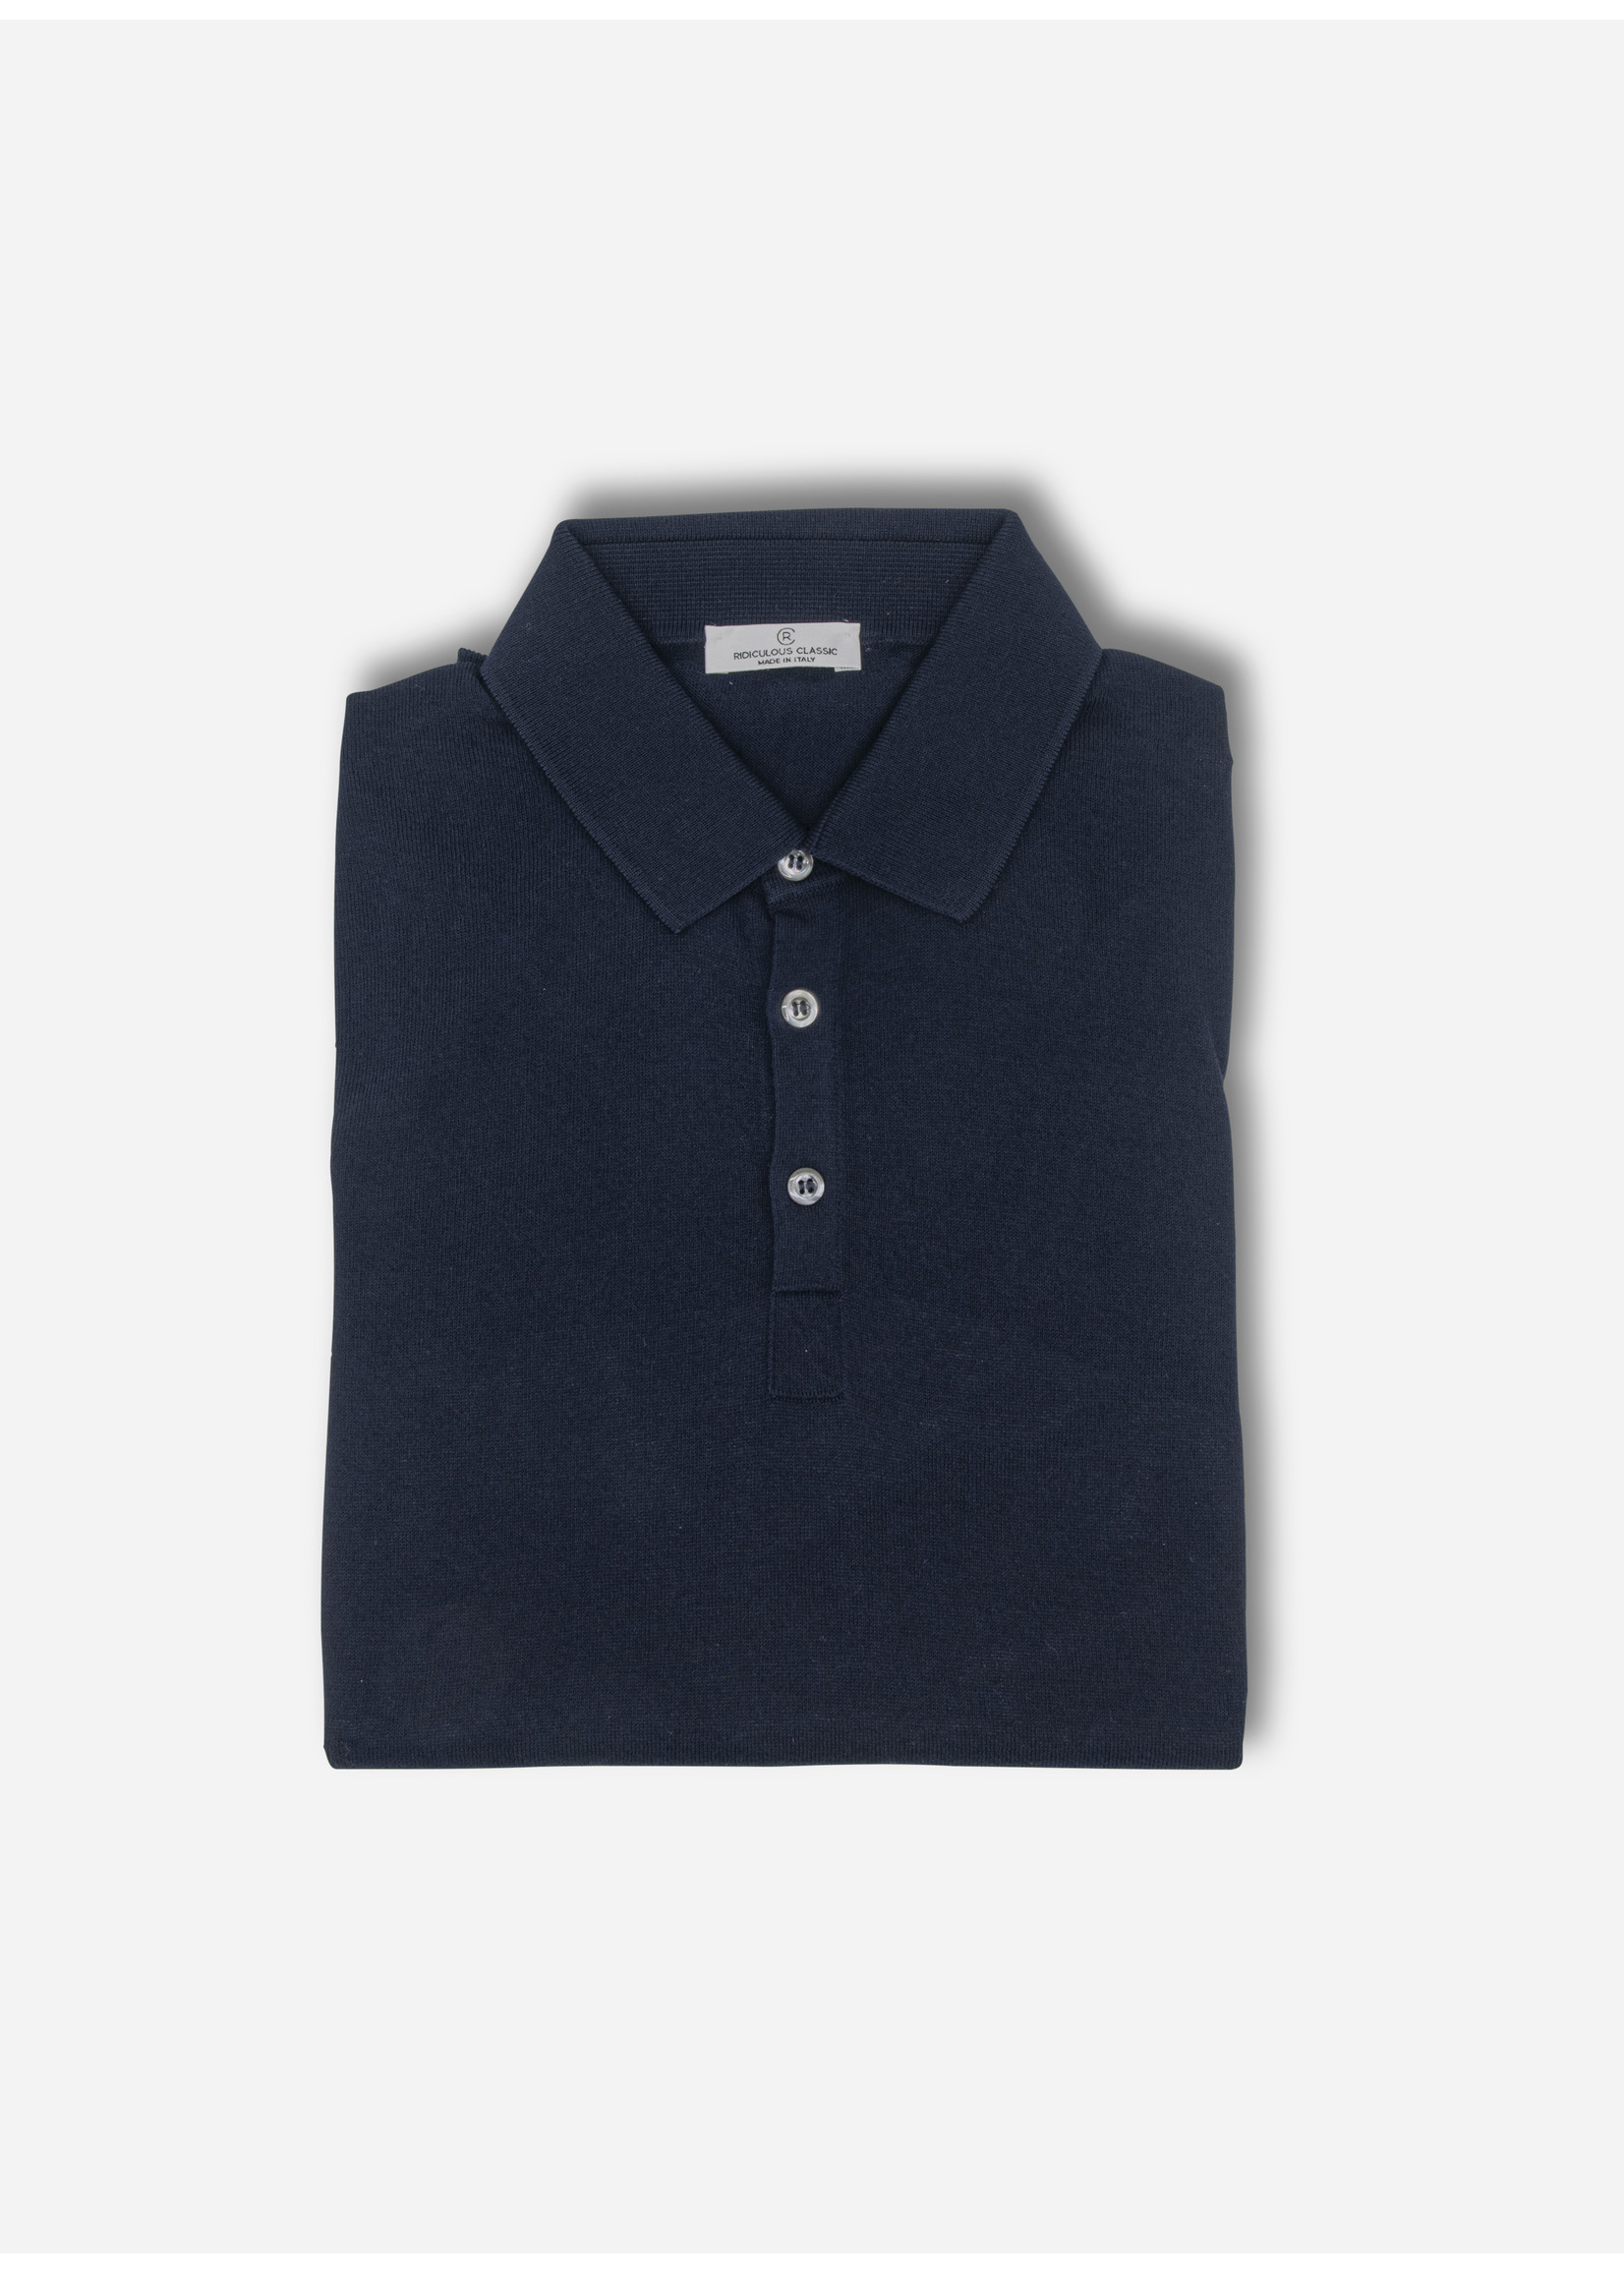 Ridiculous Classic Polo shirt navy tennis